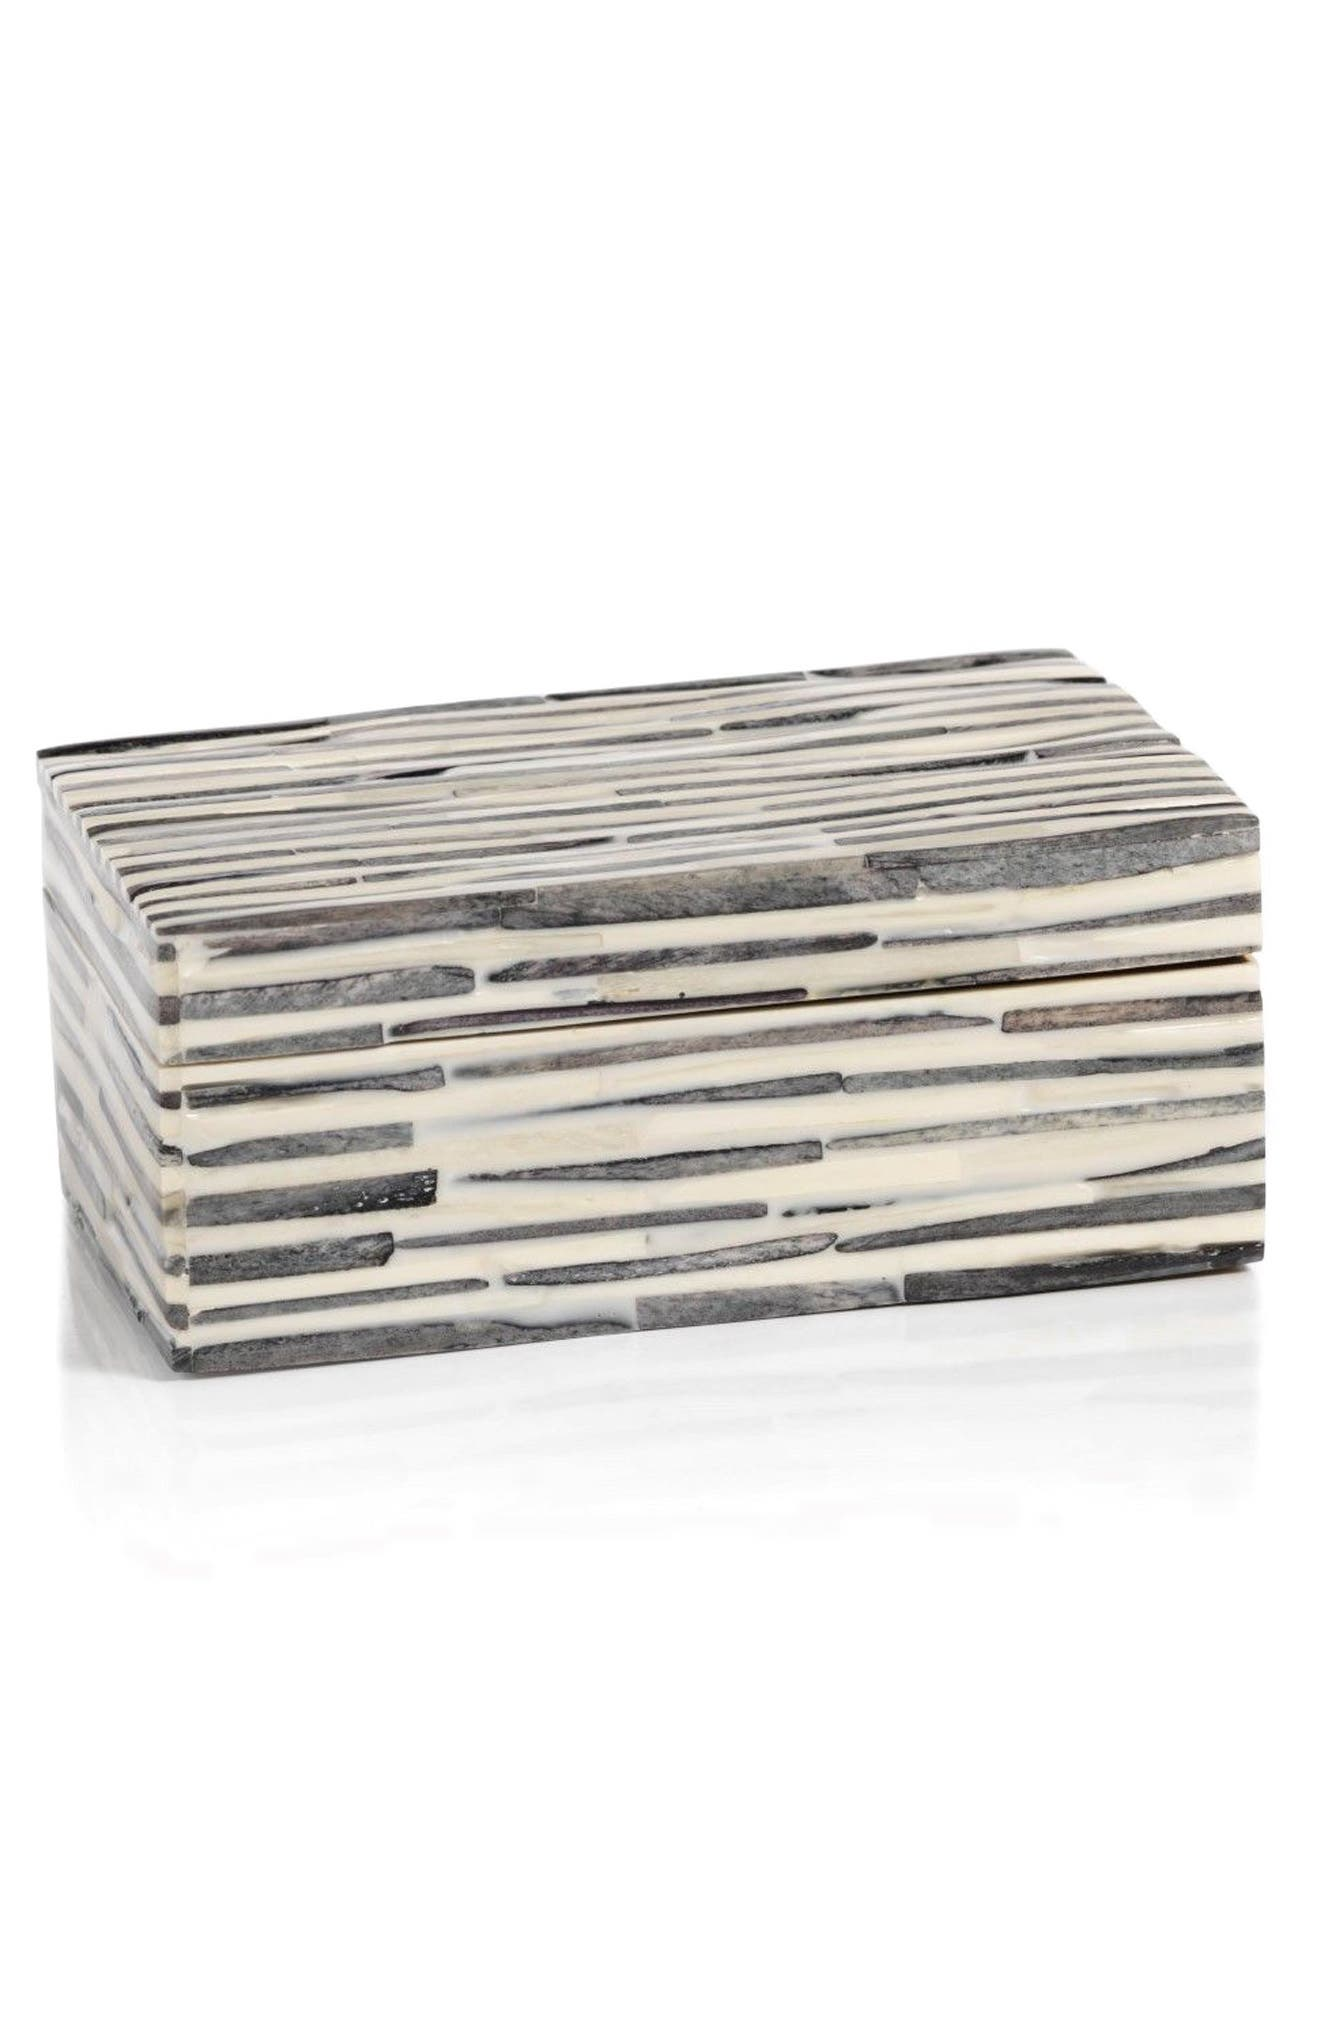 Sanur Bone Jewelry Box,                         Main,                         color, WHITE/ BLACK